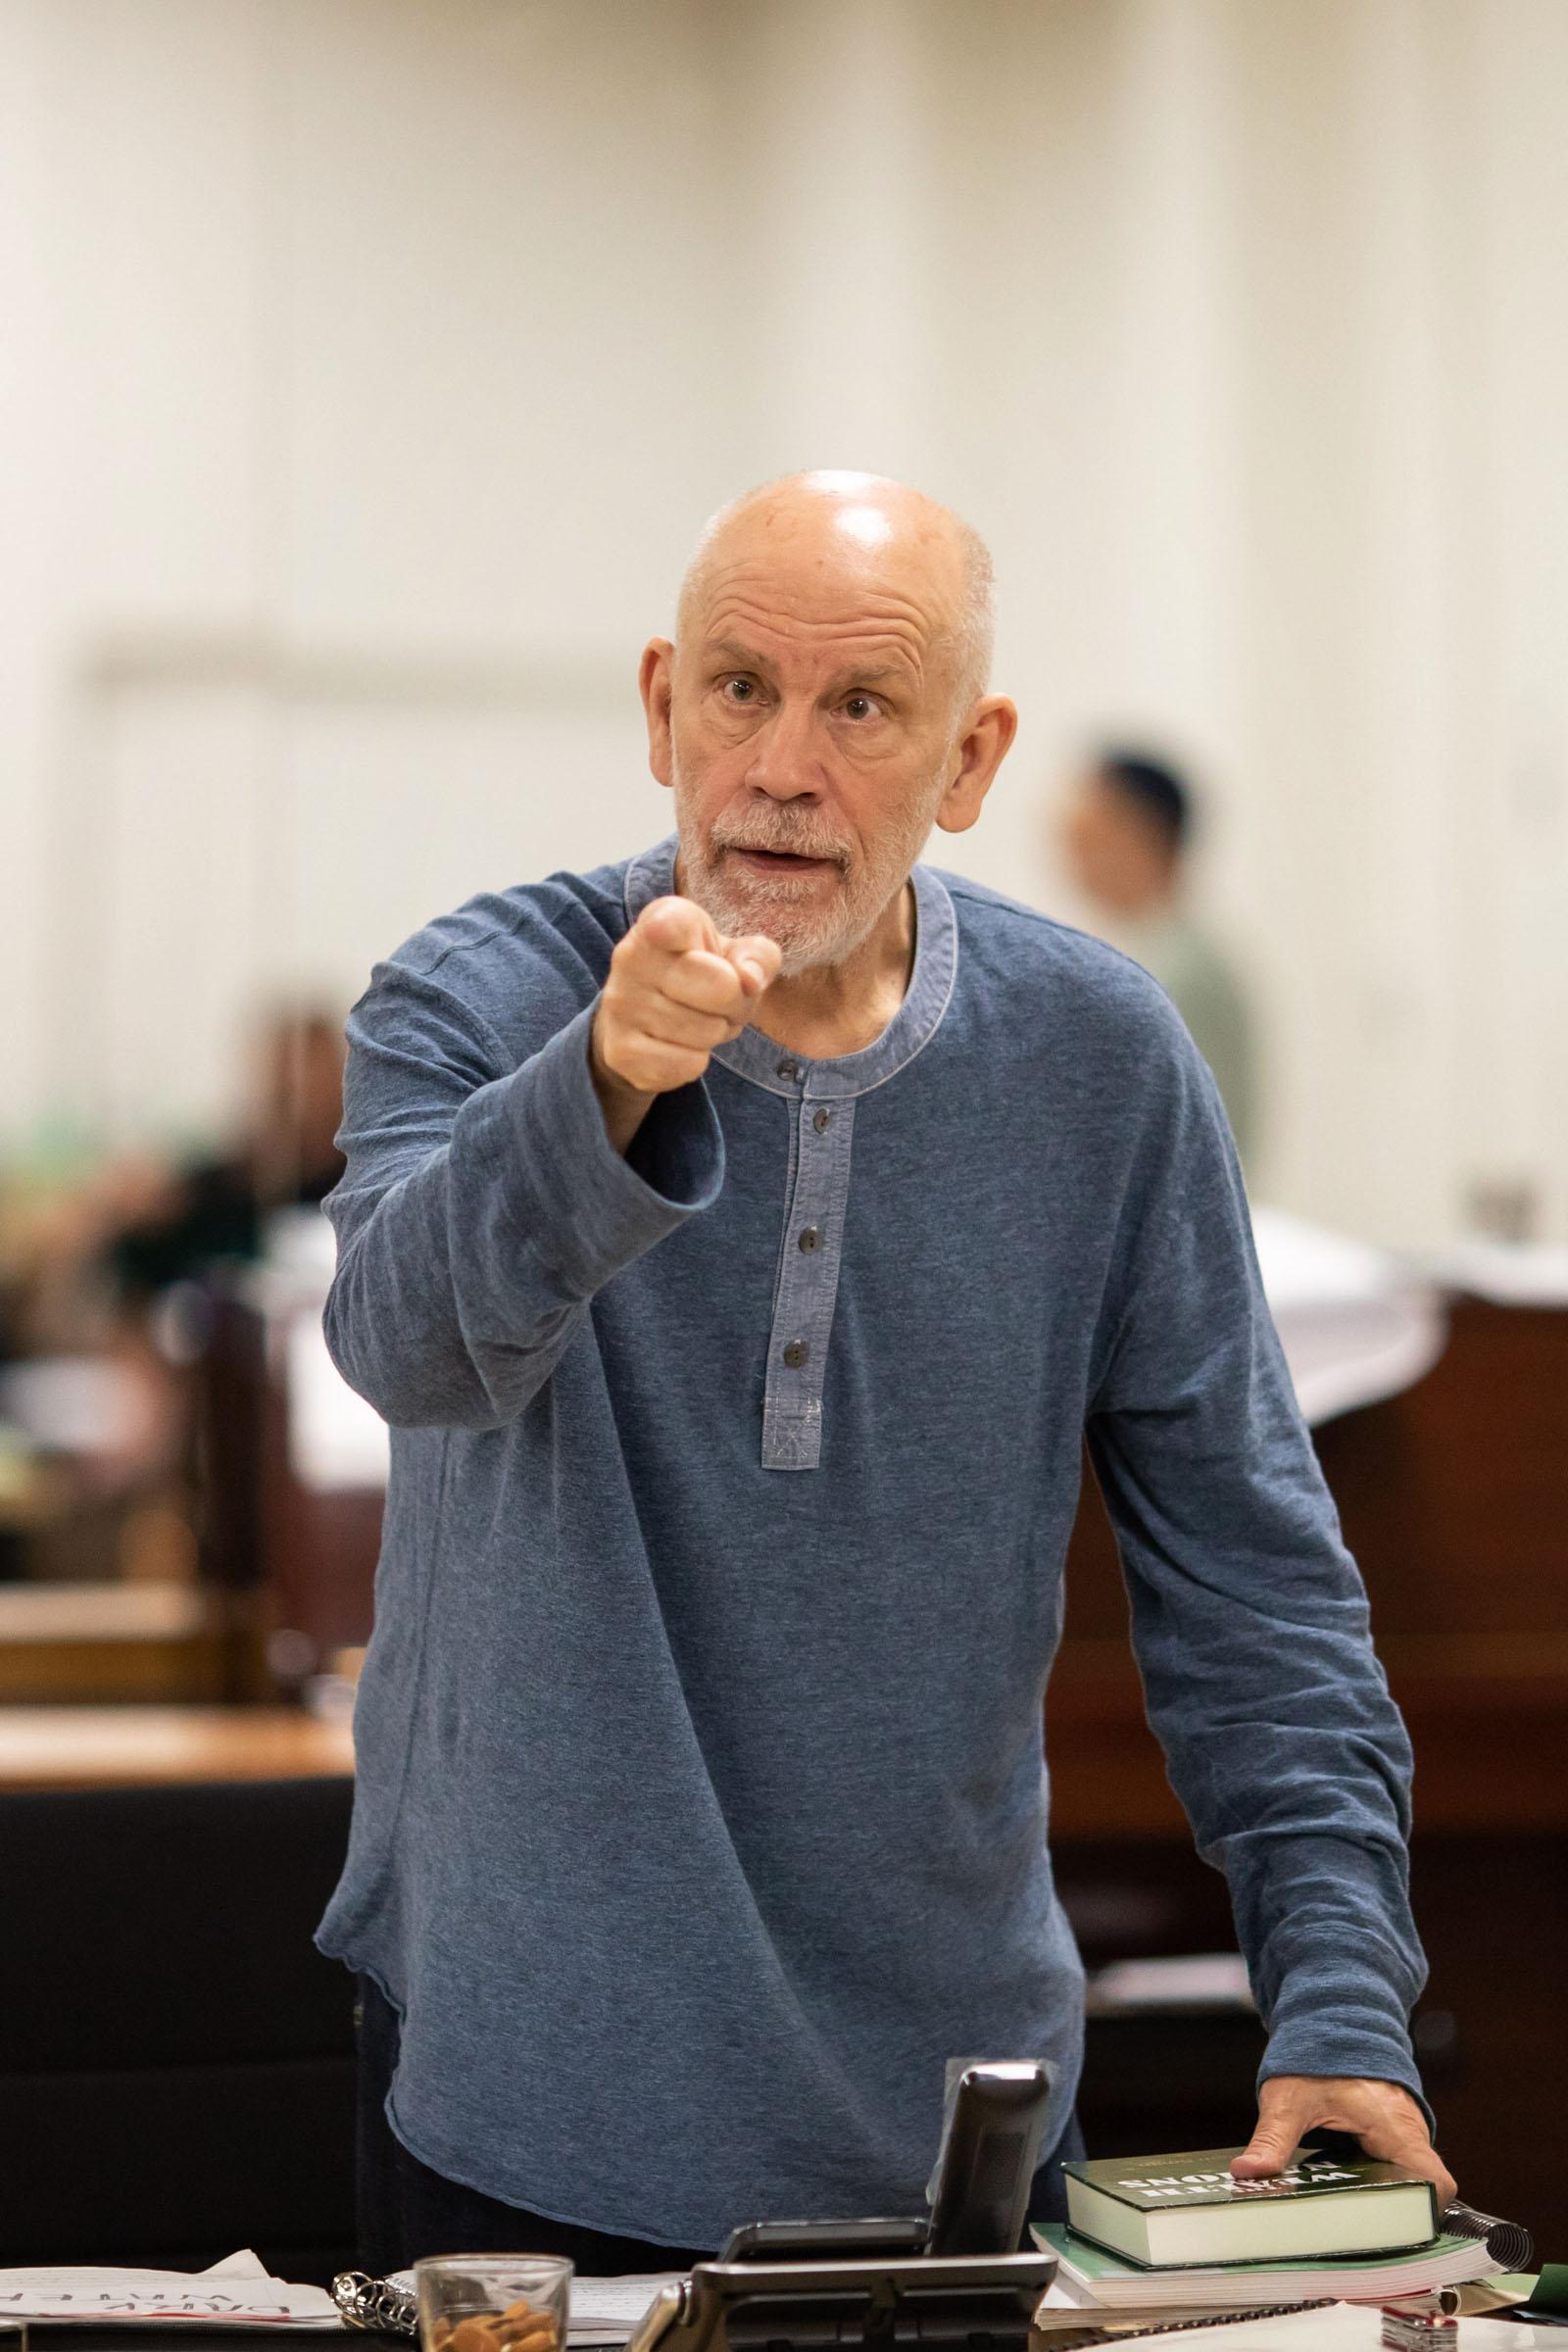 John Malkovich as Barney Fein. Theatre rehearsal photography by Helen Maybanks